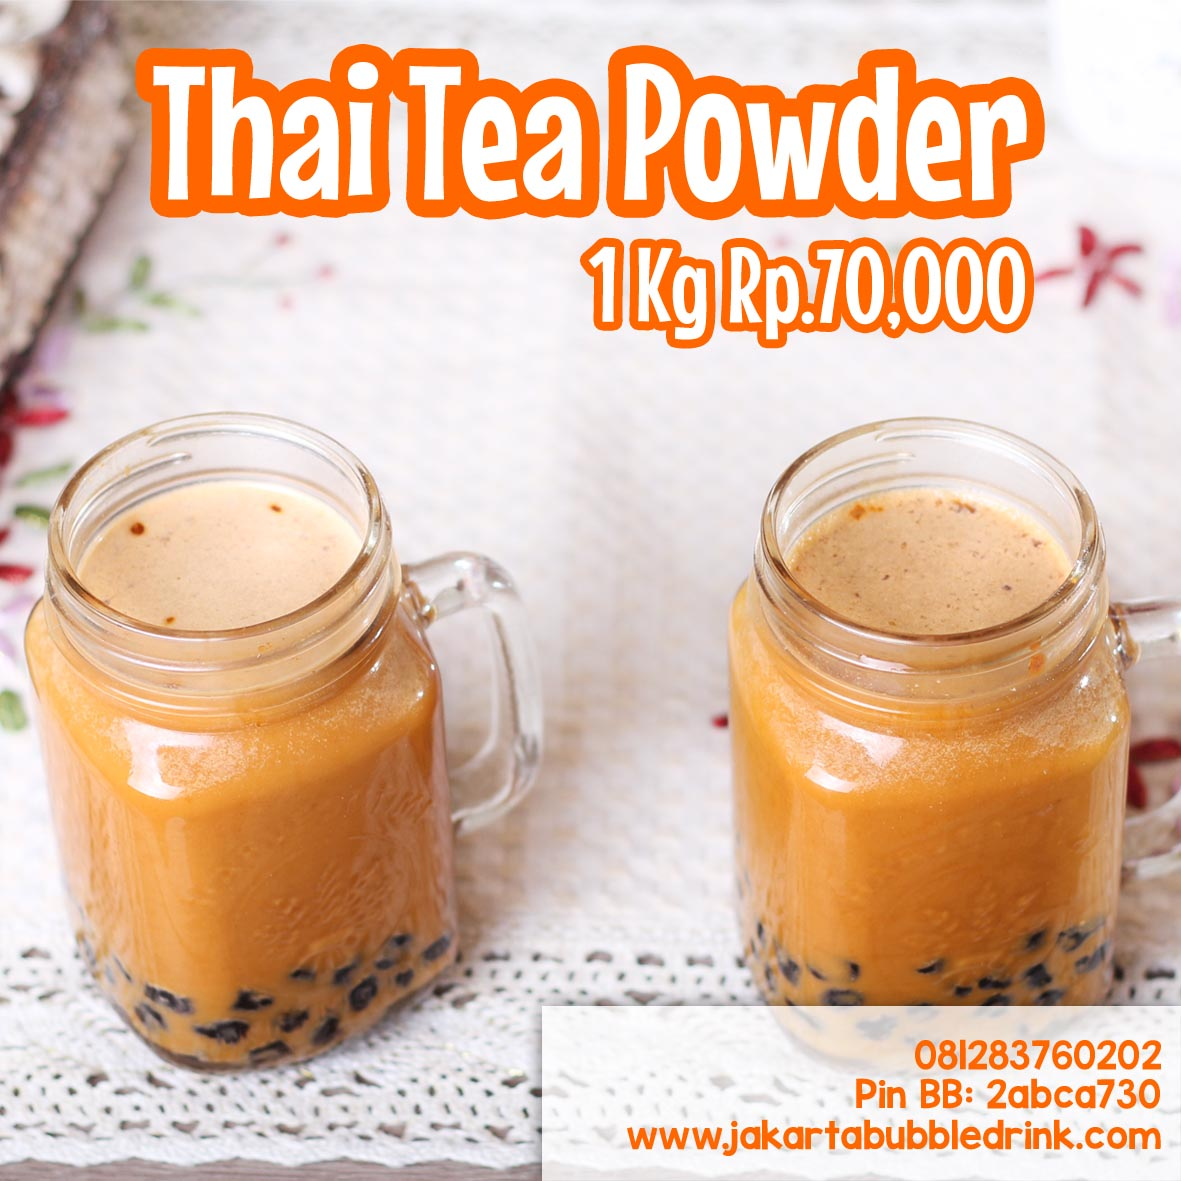 Bubuk Minuman Rasa Thai Tea Paling Laris di Makasar